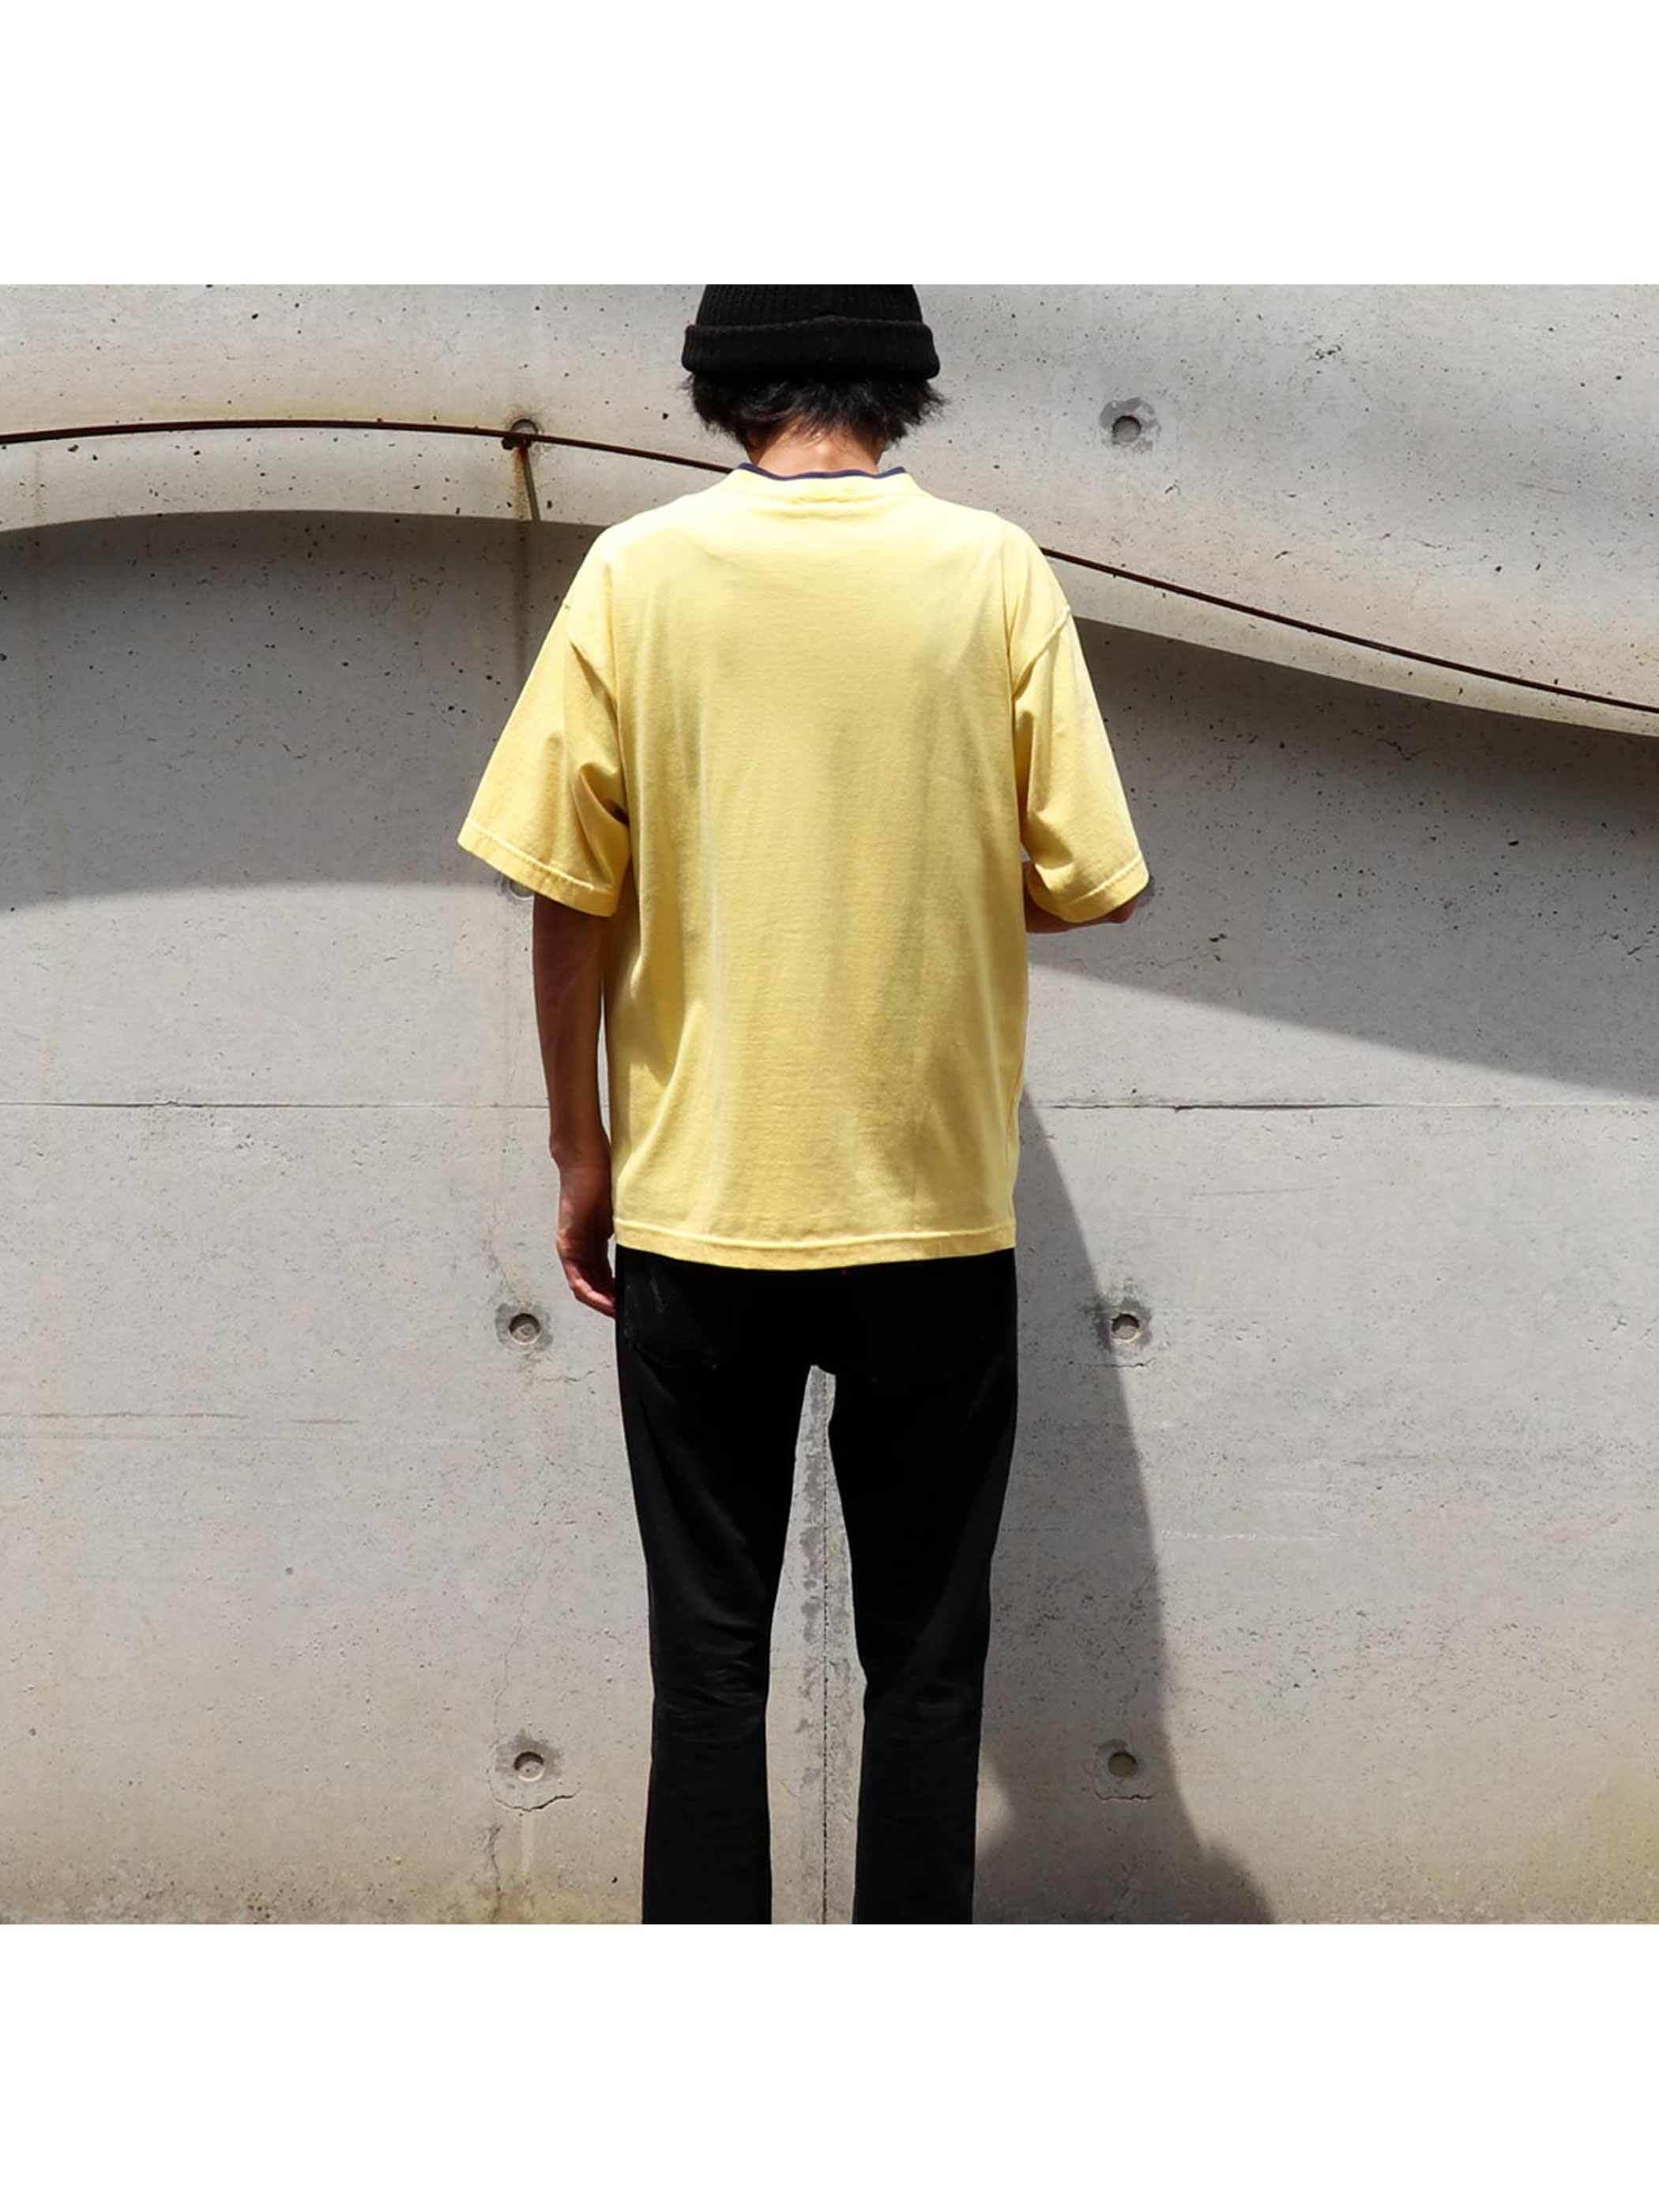 80's EDDIE BAUER USA製 ポケットTシャツ [S]